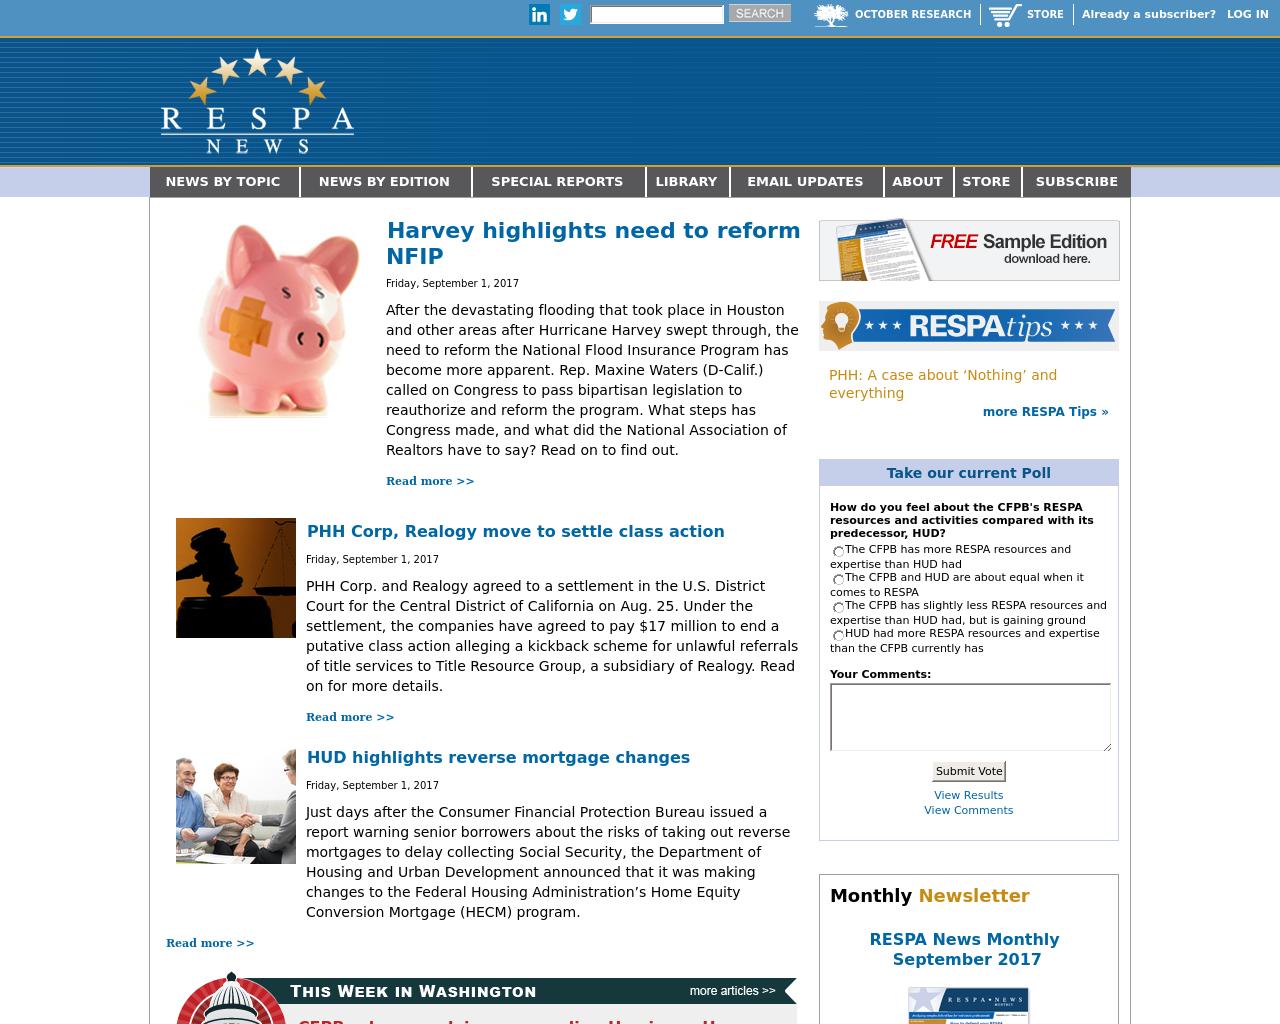 Respa-News-Advertising-Reviews-Pricing